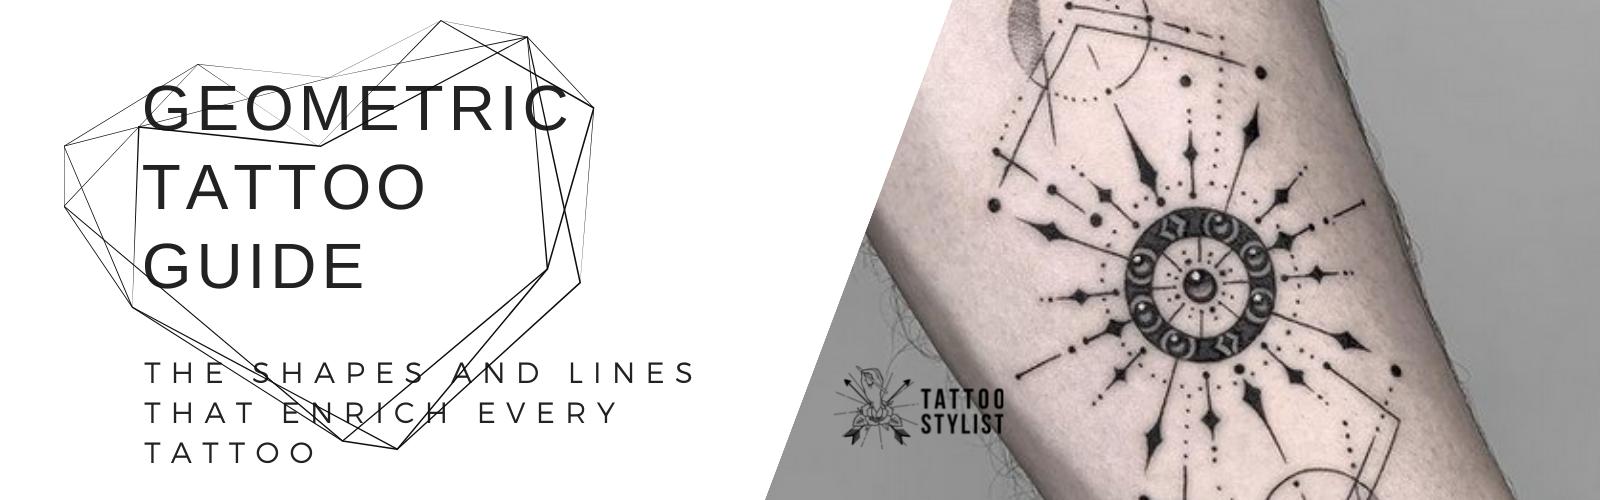 geometric tattoo guide featured image